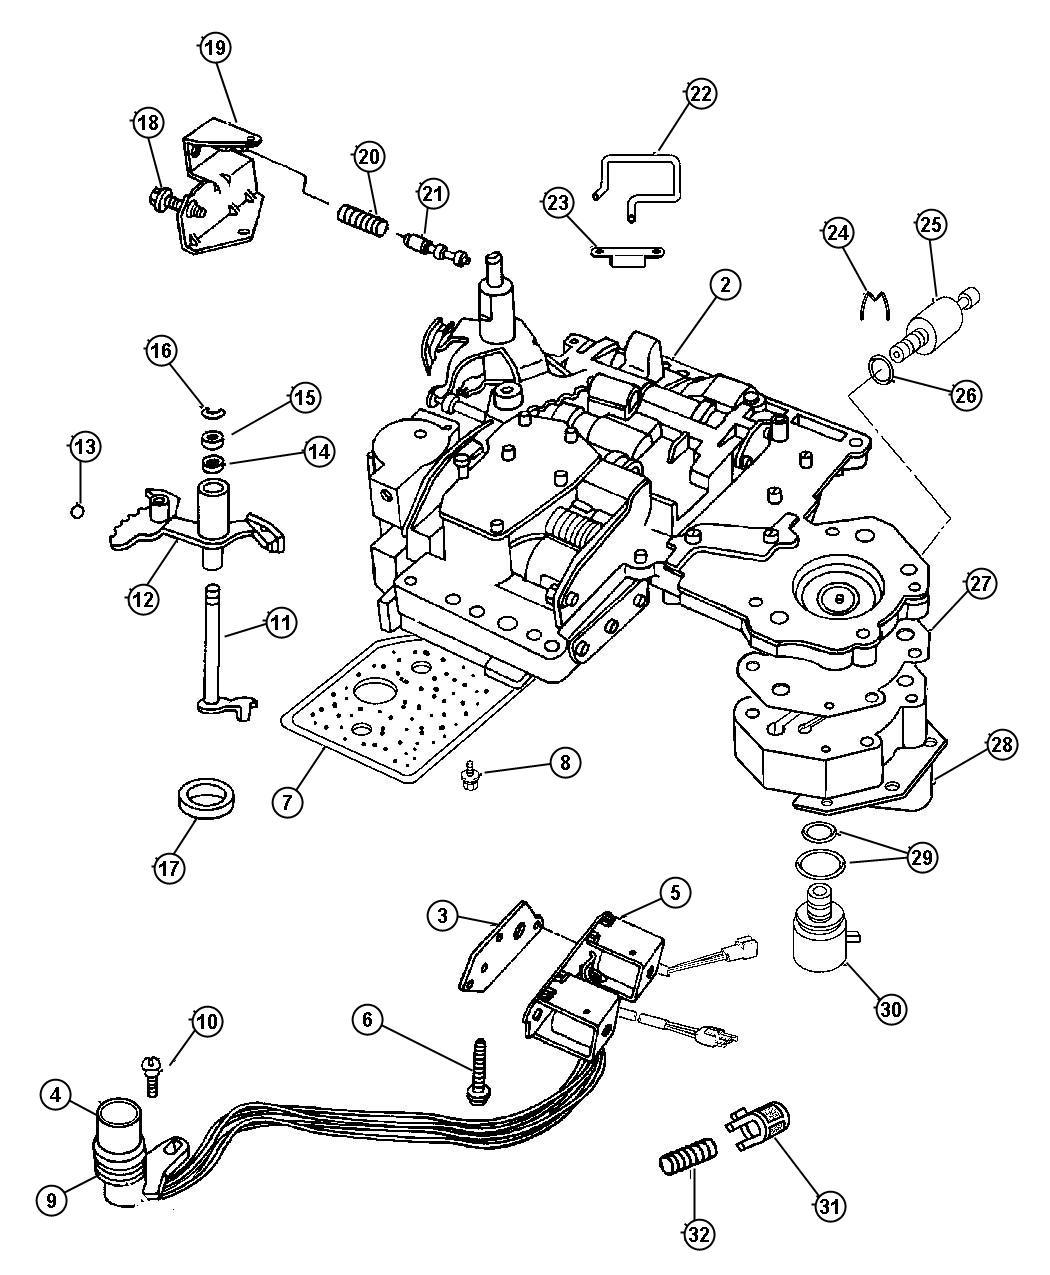 [DIAGRAM] Dodge 47re Transmission Wiring Diagram FULL